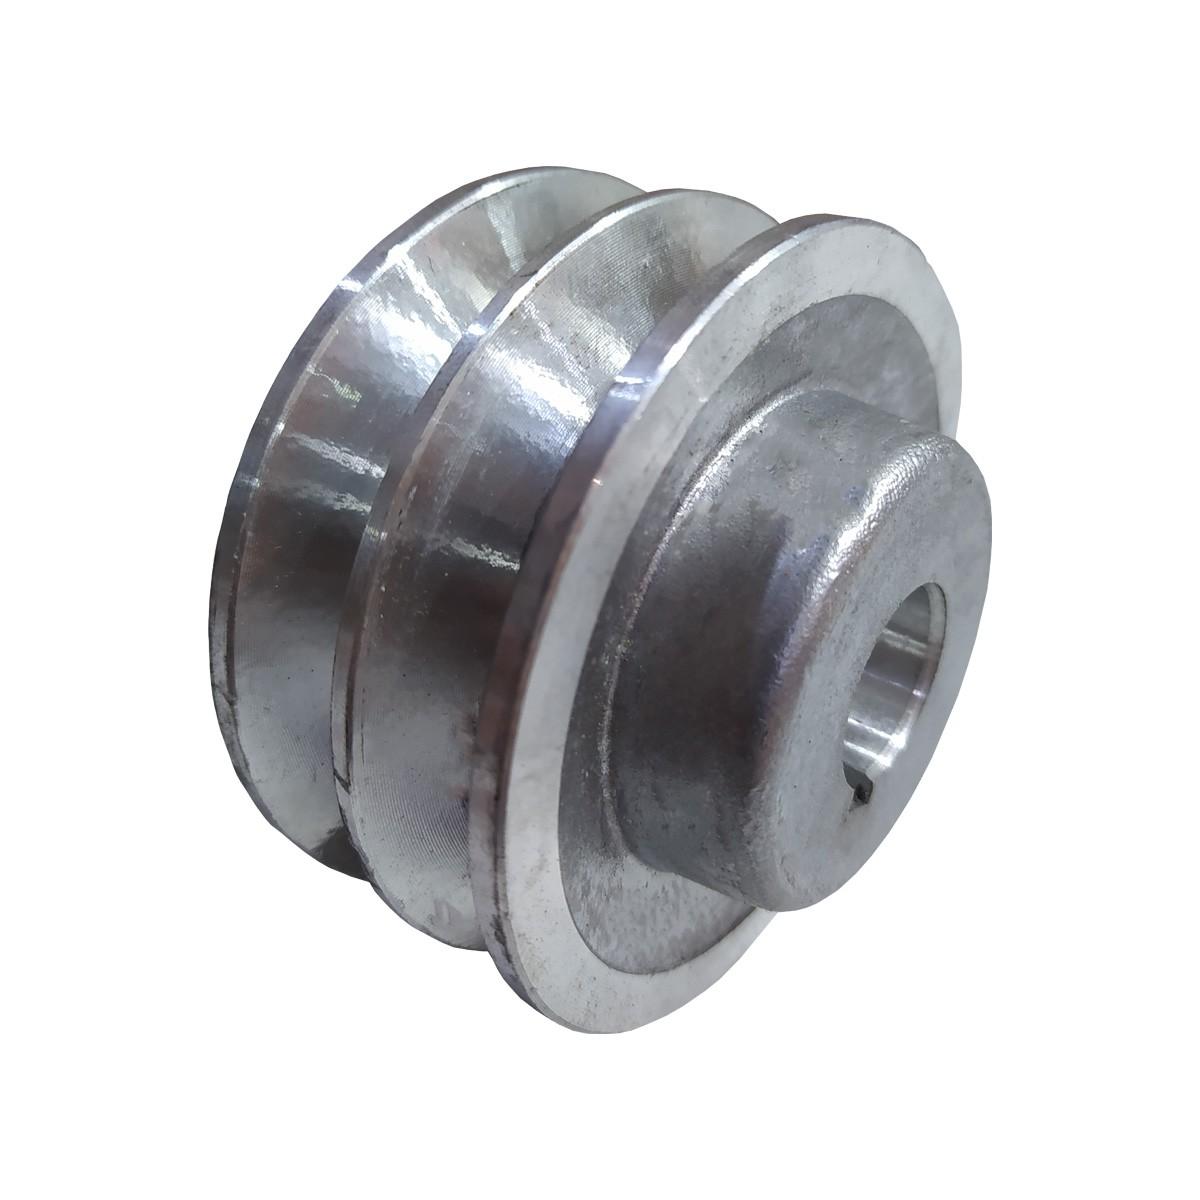 Polia De Aluminio 100mm Motor Furo 28mm 2 Canal A Chaveta